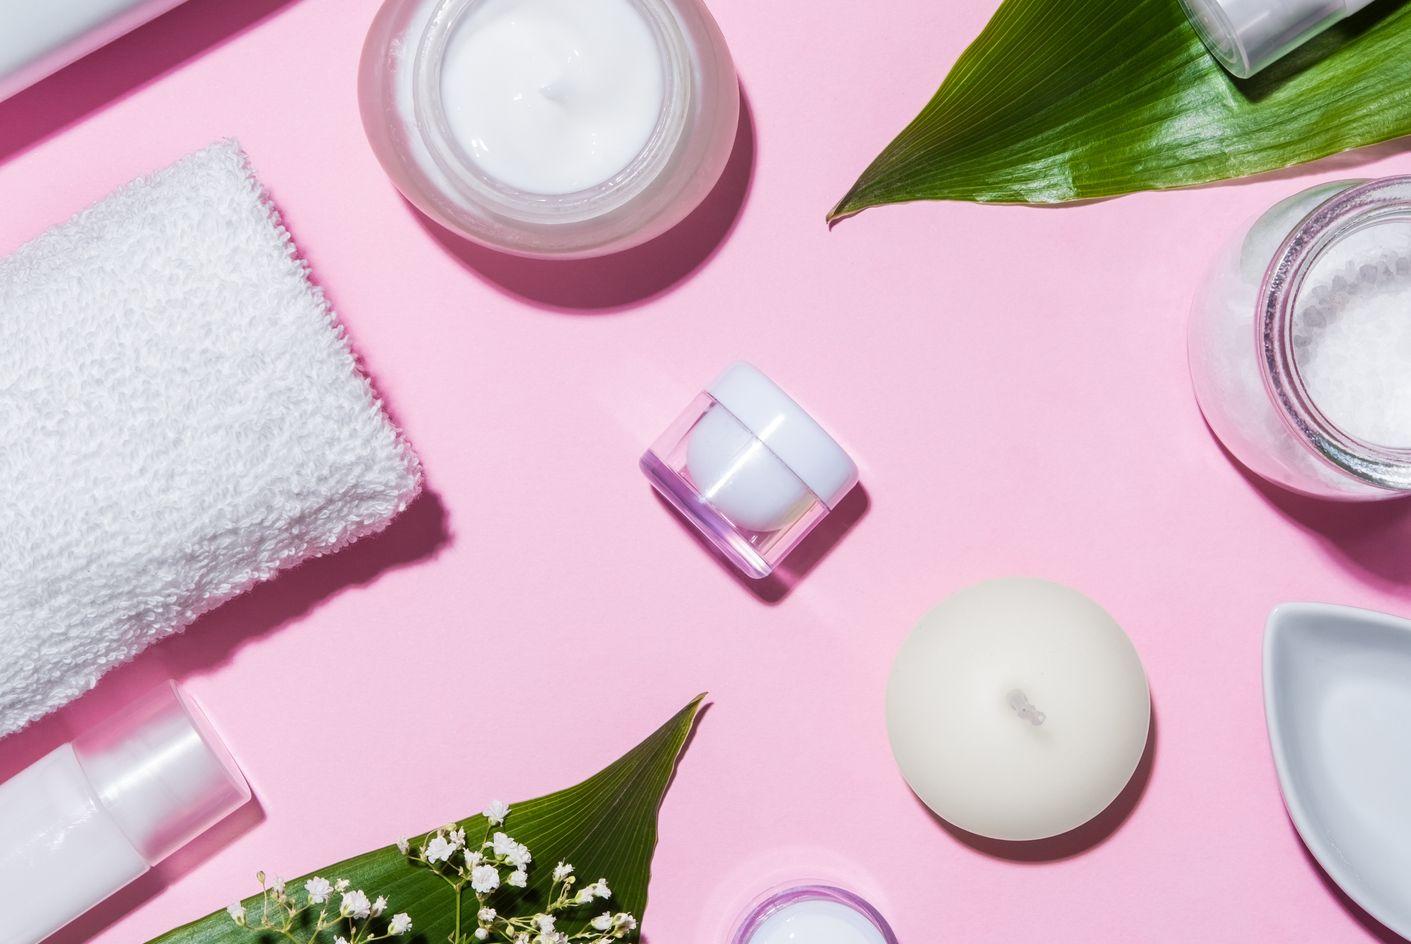 Fashion cosmetics products